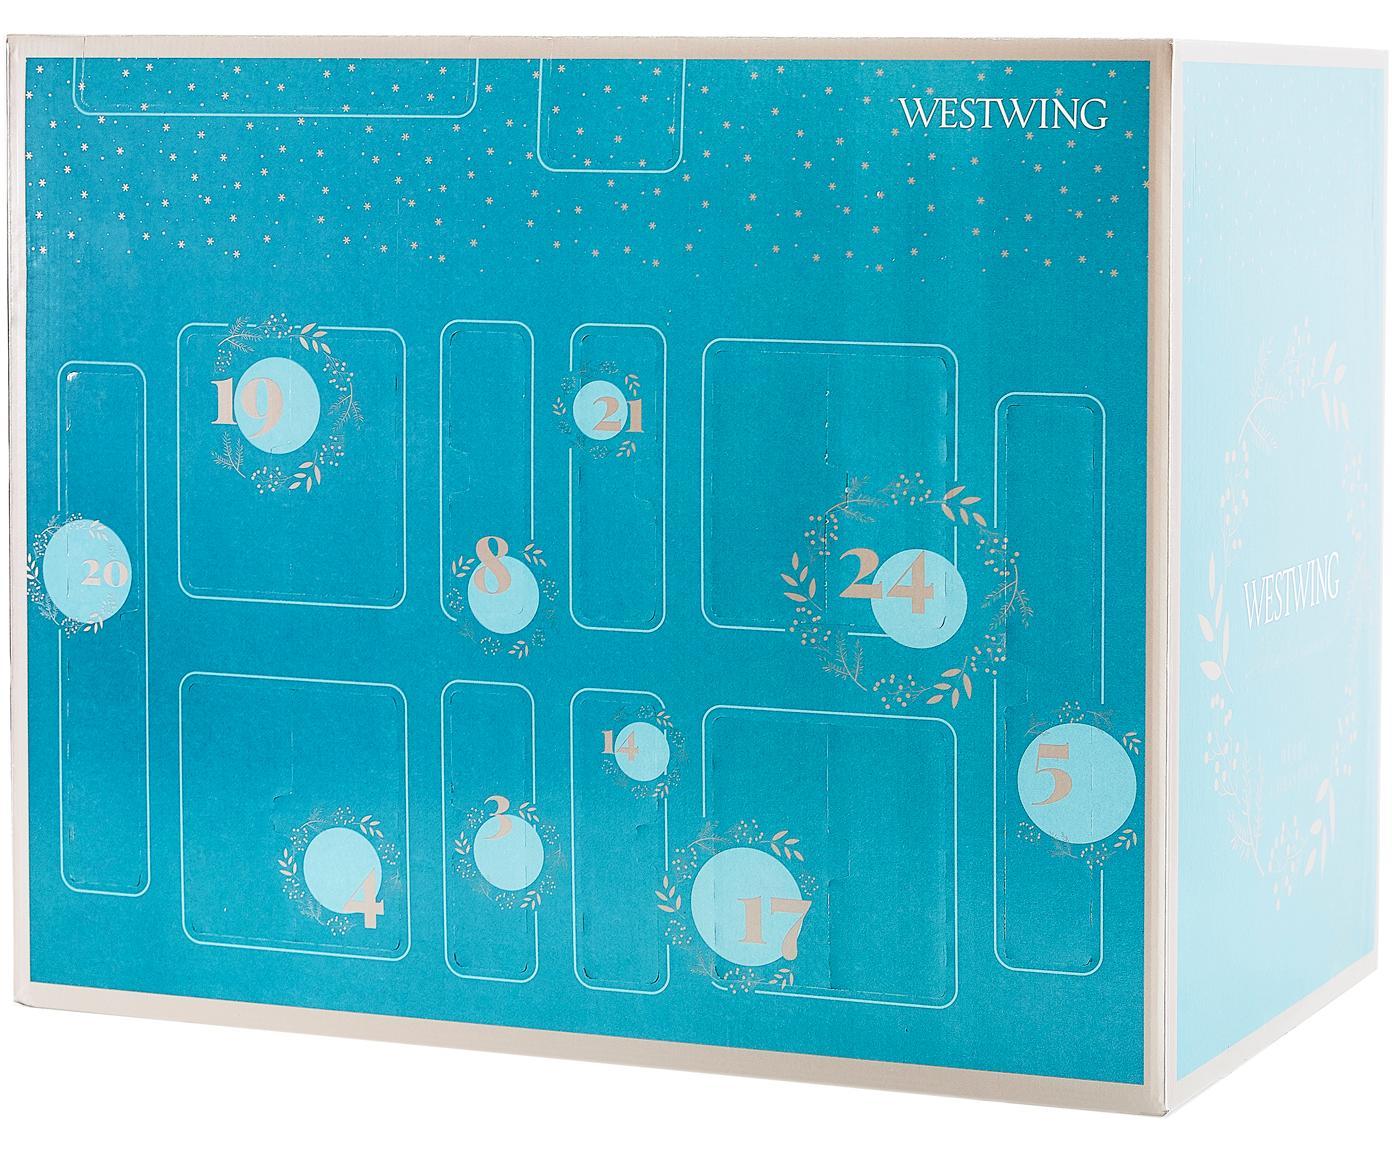 Westwing-Adventskalender, Box: Papier, Türkis, 57 x 47 cm